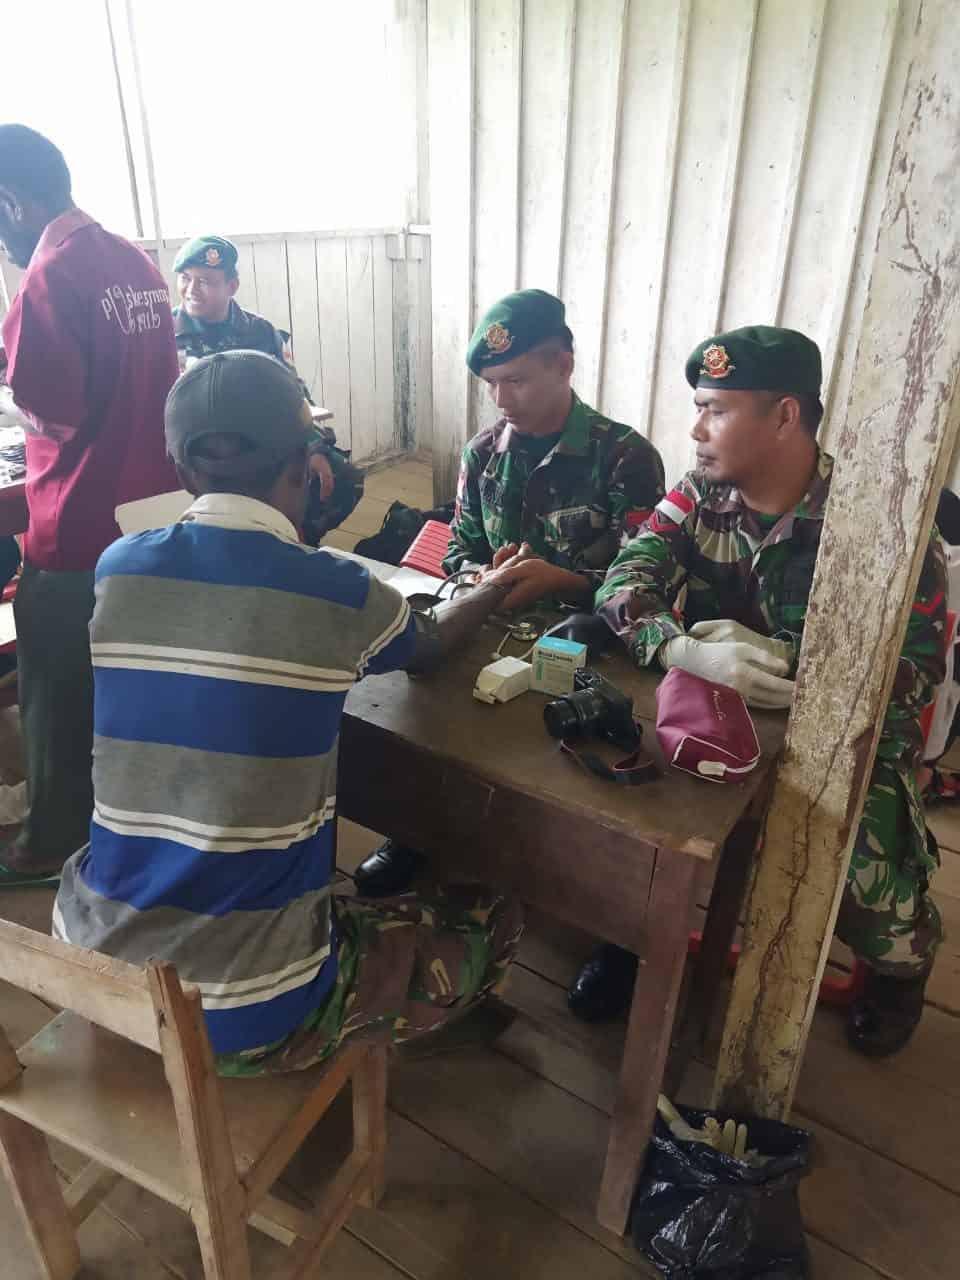 Jamin Kesehatan Warga Papua, Satgas Yonif R 509 Gelar Pengobatan Massal di Pegunungan Bintang